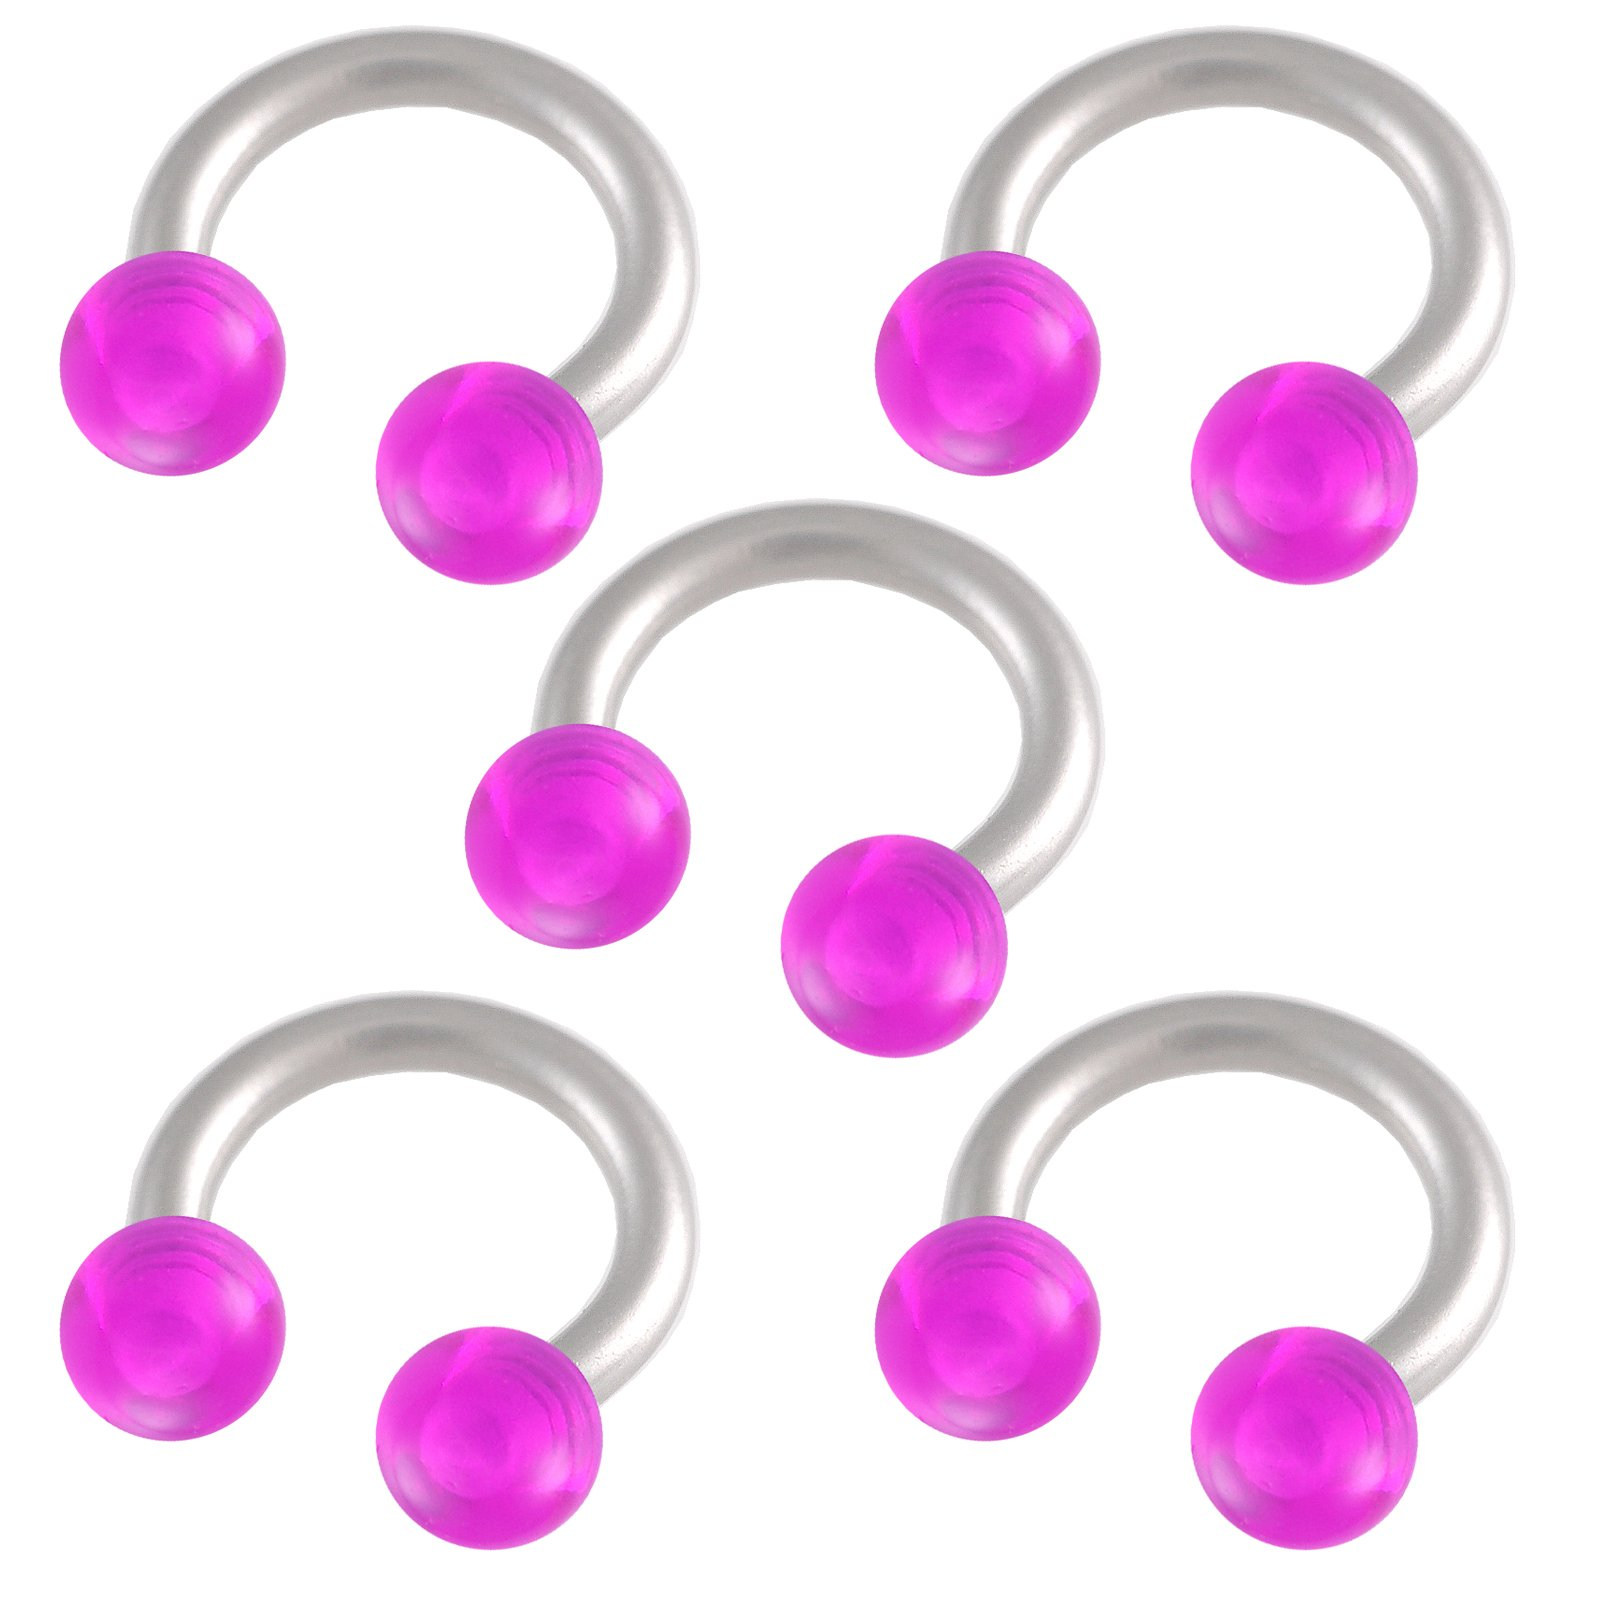 bodyjewellery 16g 16 gauge 1.2mm 1/4 6mm steel circular barbell horseshoe bar ring lip tragus studs eyebrow AUTI 5Pcs